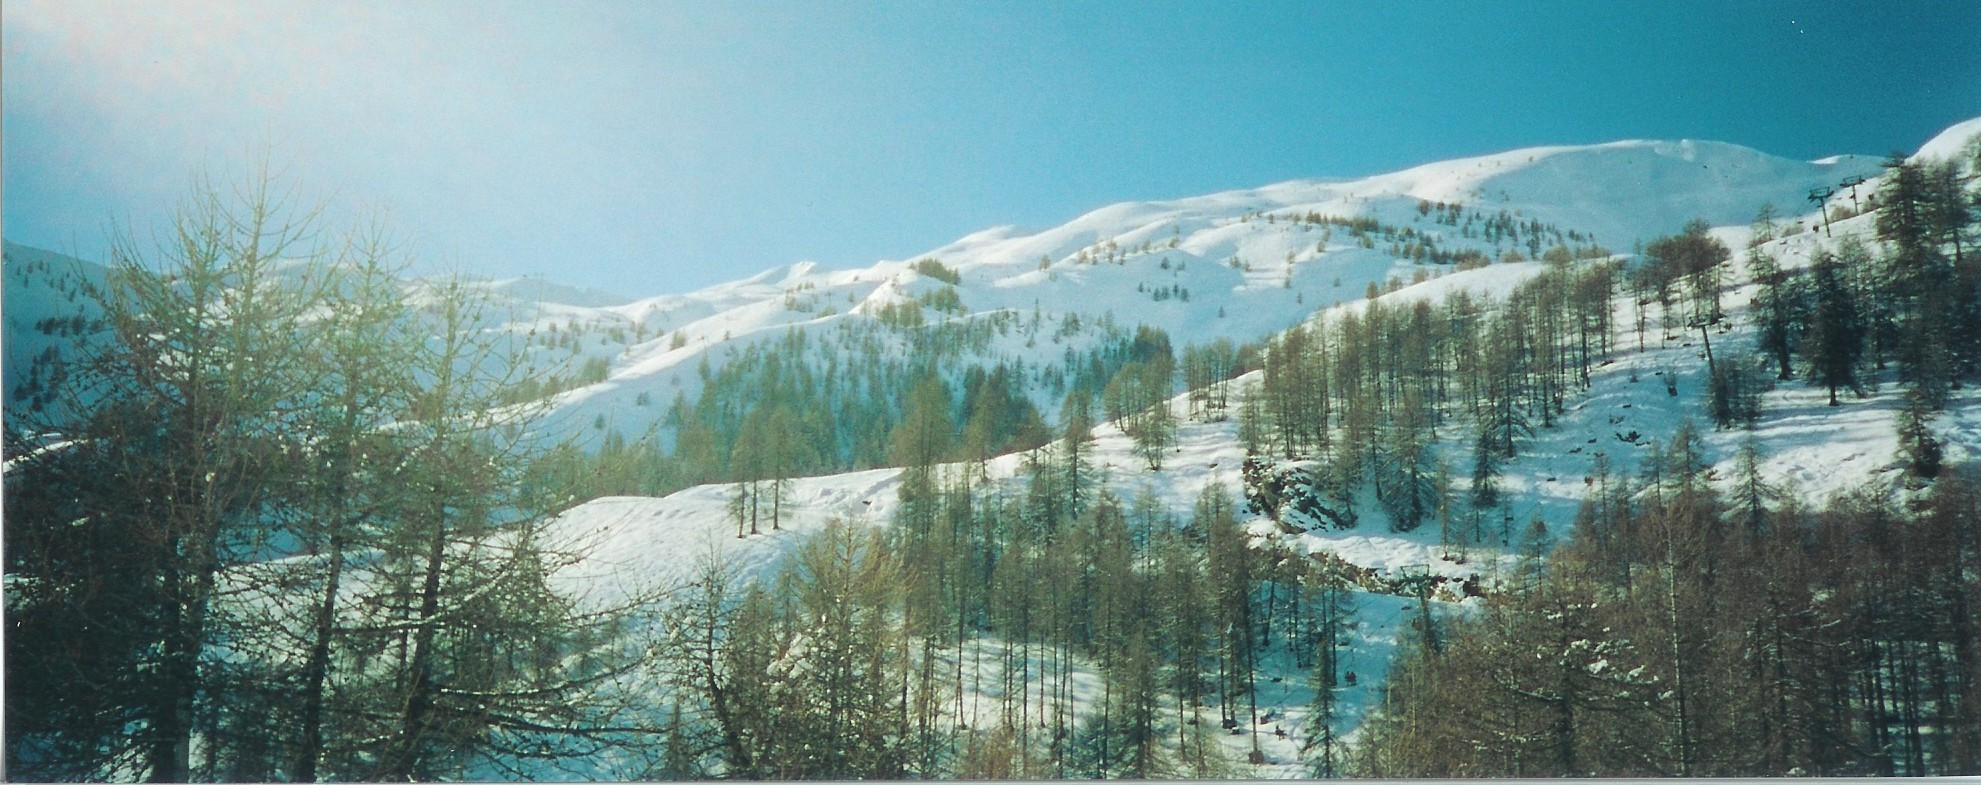 Le Seignus Allos, Val d'Allos 1500 Le Seignus